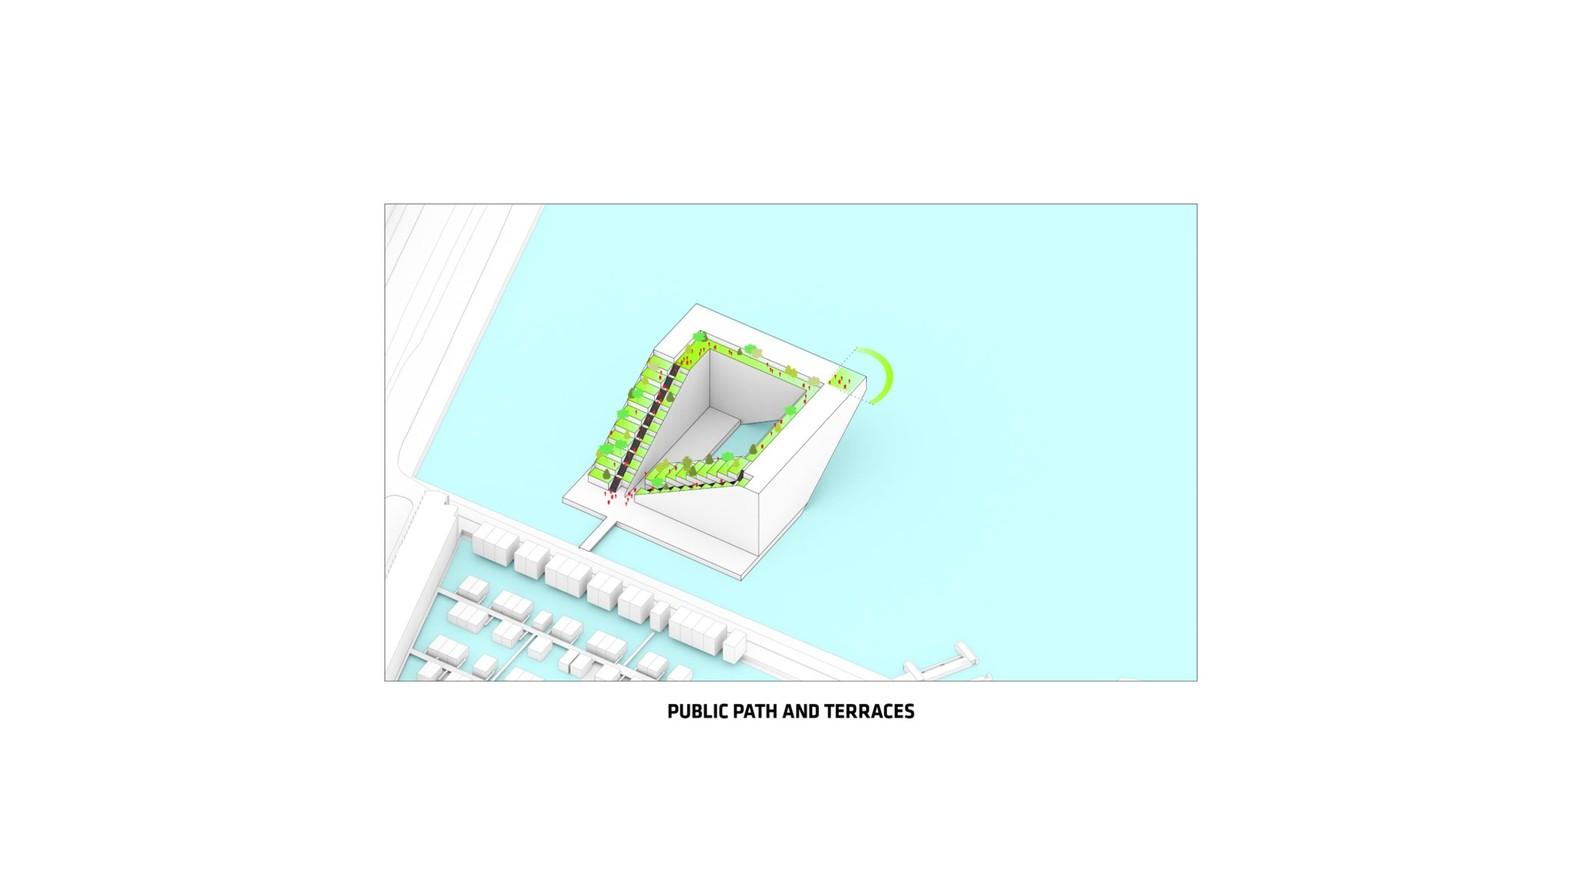 sluishuis-big-and-barcode-architecture-plant-08 – Lopes Dias